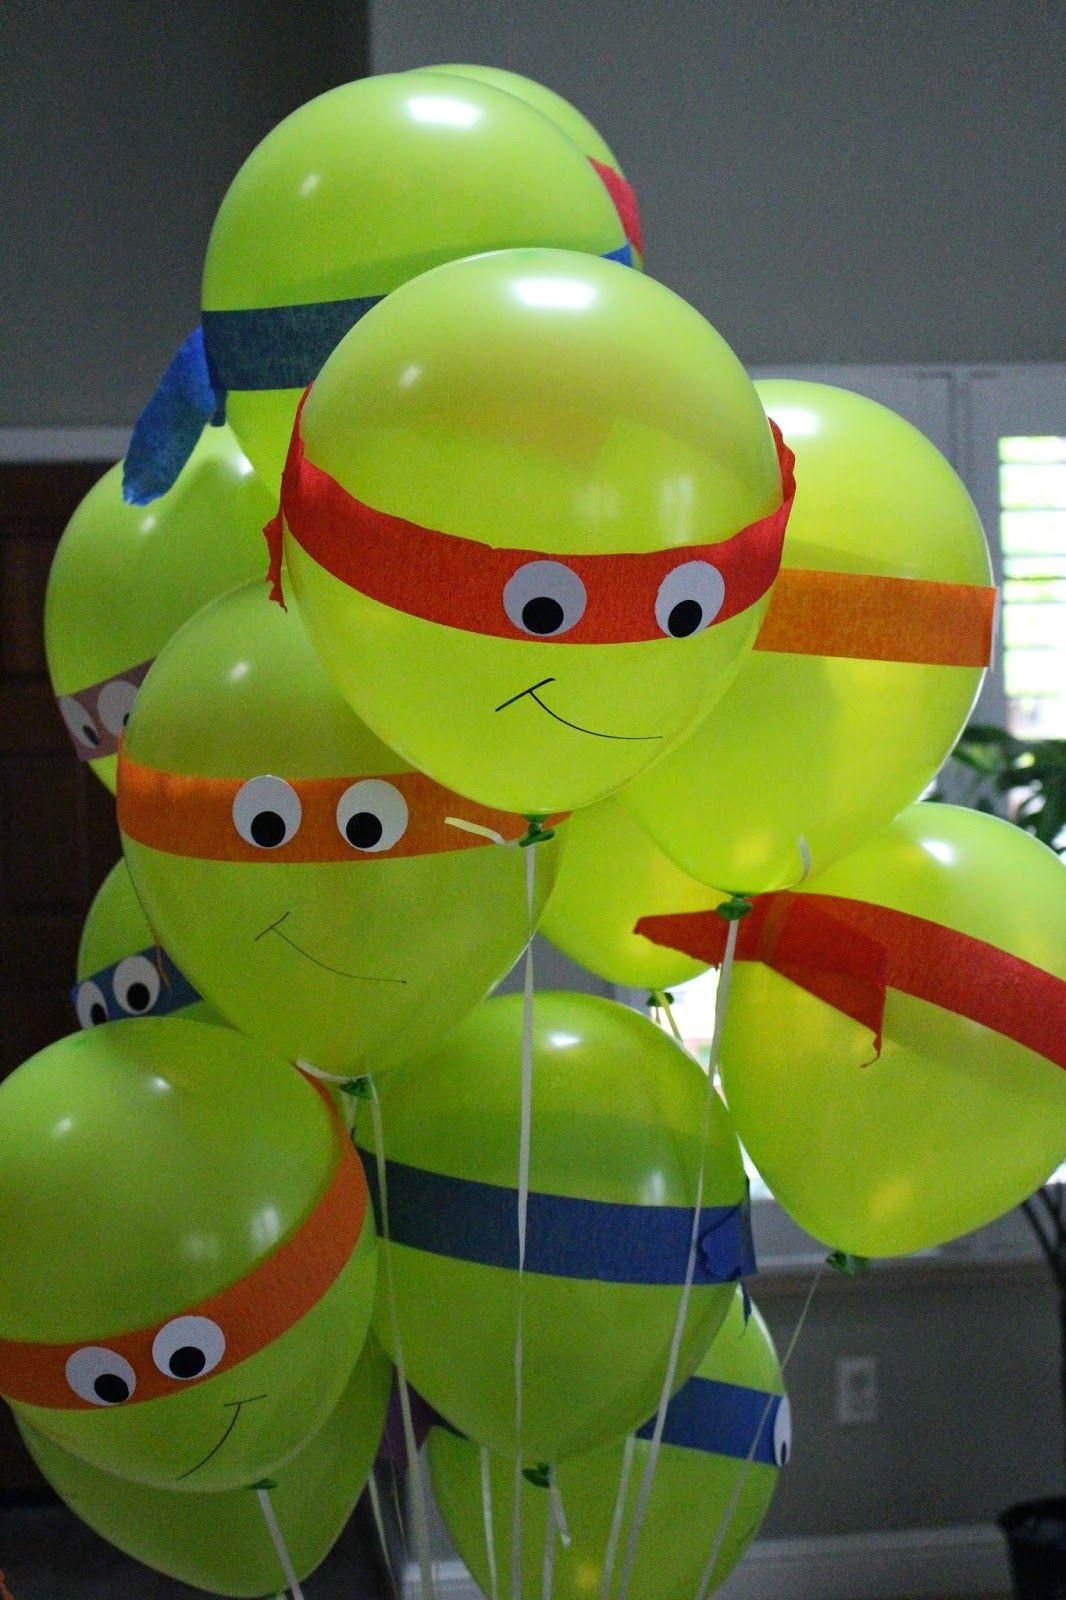 Pin By Rosa Reyes De Gonzalez On From The Blog Ninja Turtles Birthday Party Tmnt Birthday Turtle Birthday Parties